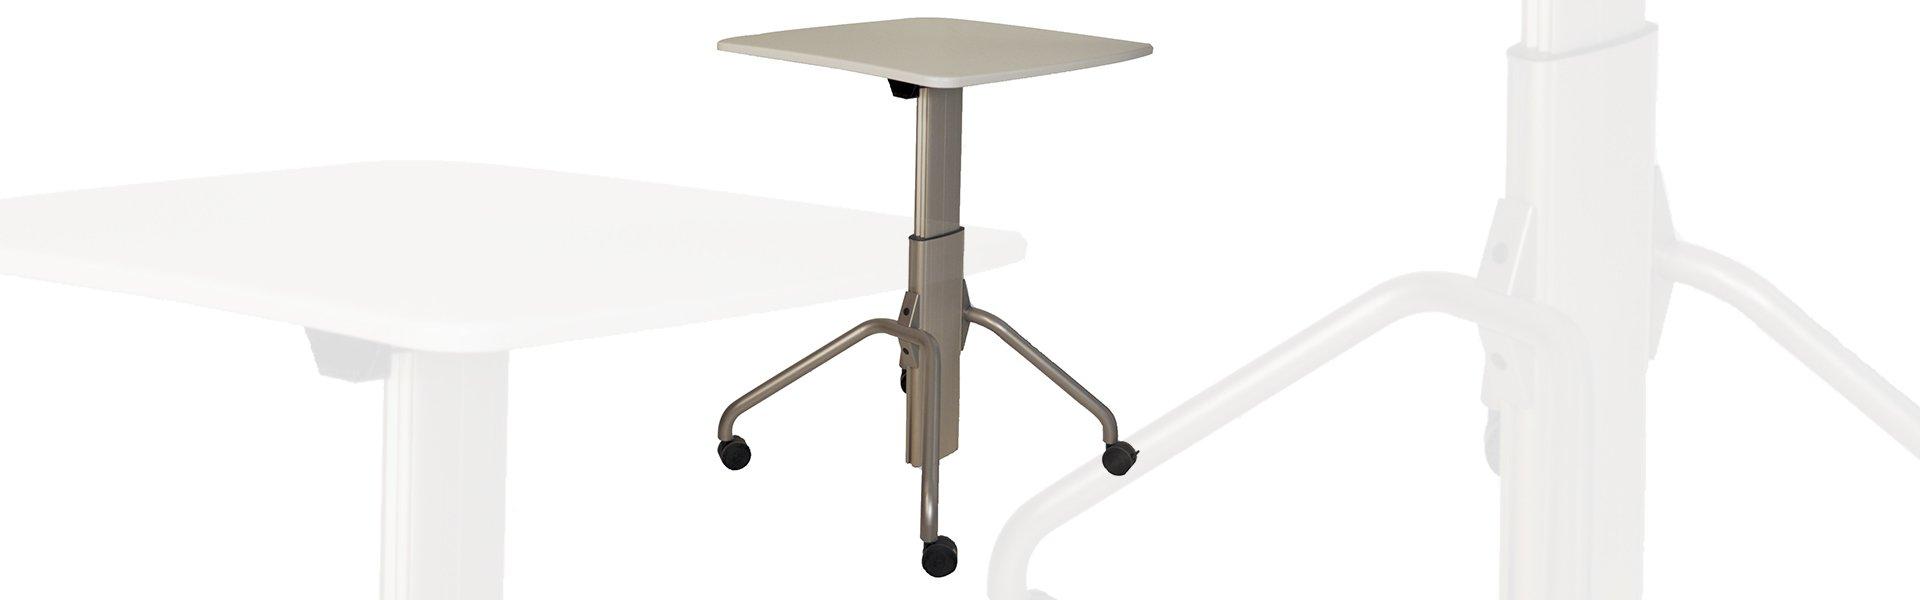 Corilam Consult Table web